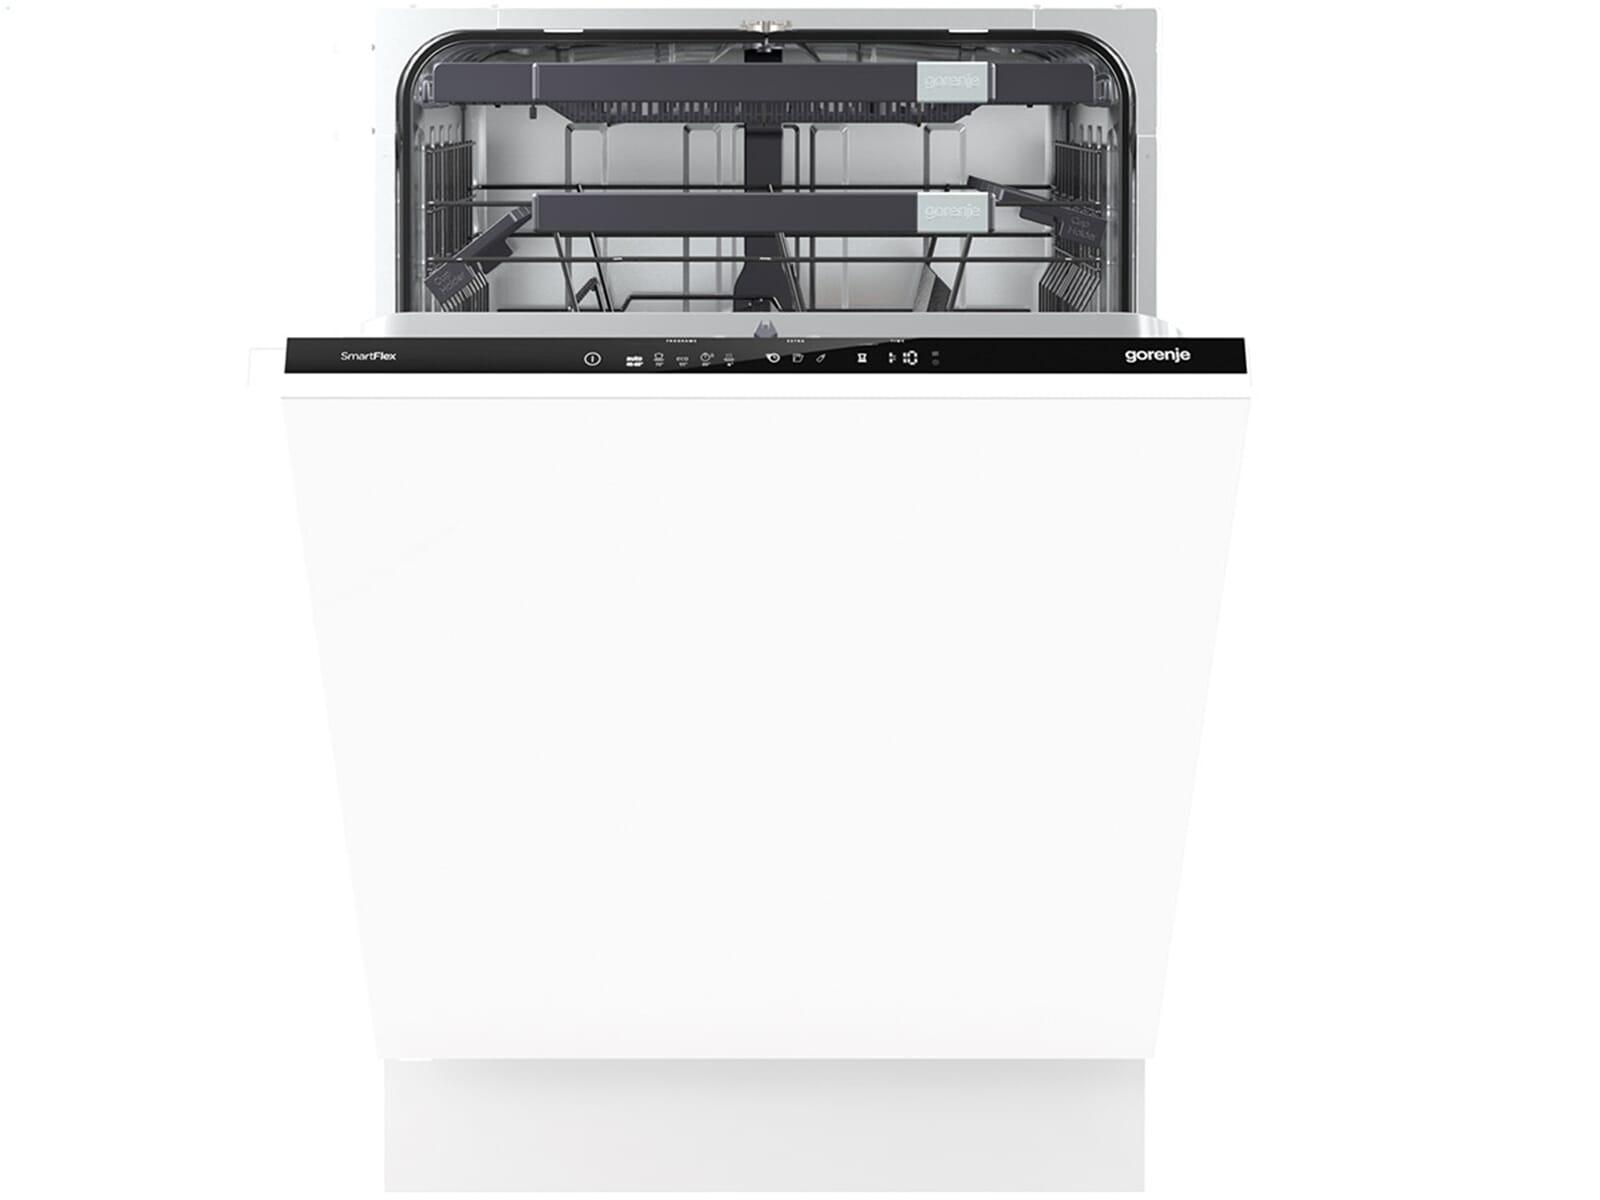 Gorenje Kühlschrank Xxl : Gorenje gv xxl vollintegrierbarer einbaugeschirrspüler